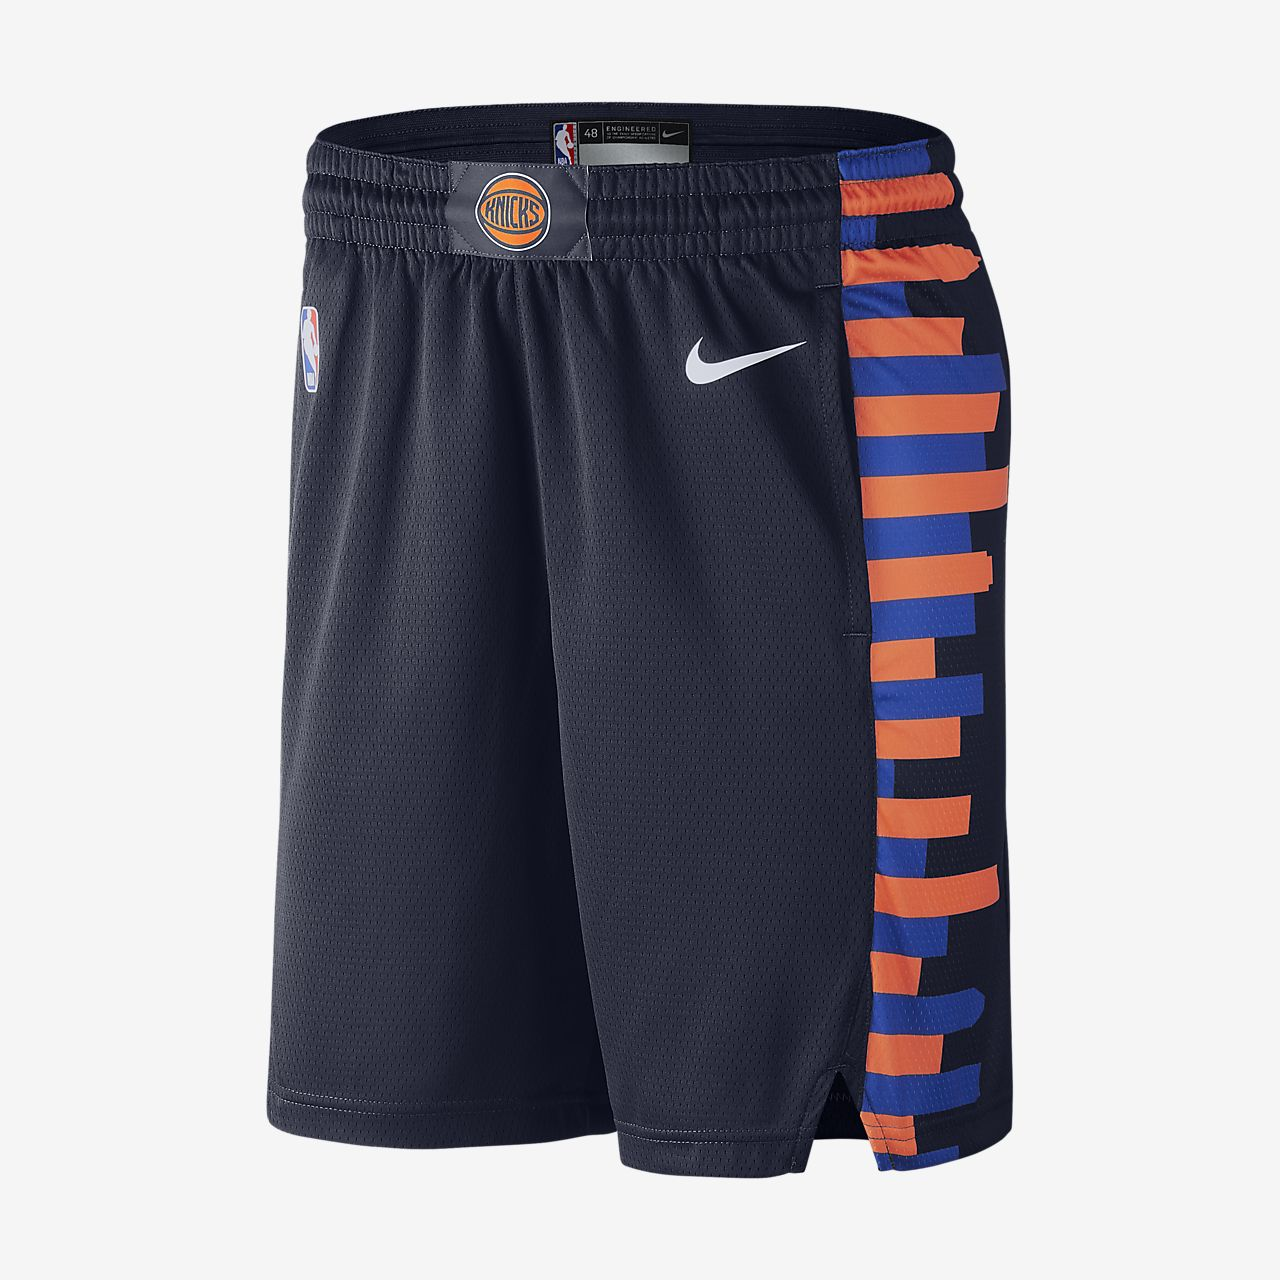 sports shoes b68b5 59b6e Men s Nike NBA Shorts. New York Knicks City Edition Swingman